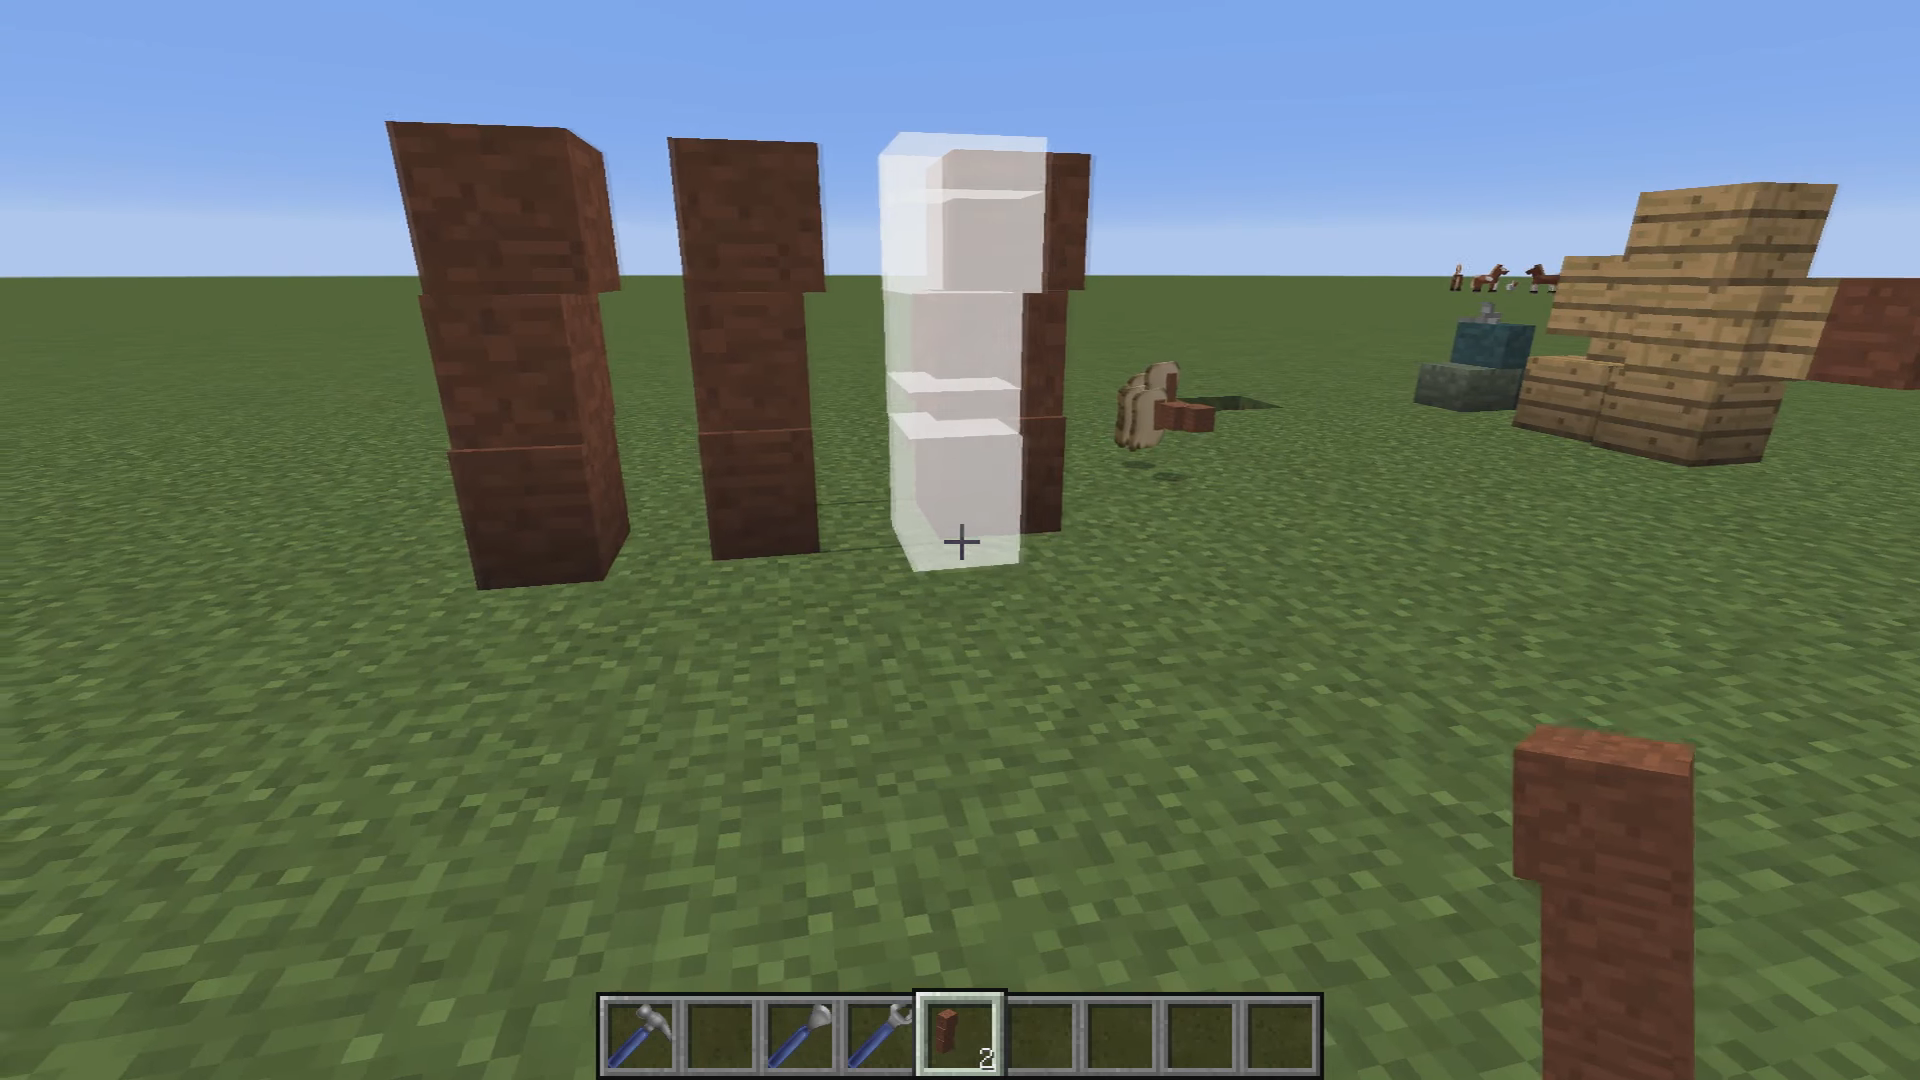 Мод LittleTiles (Маленькие блоки) - скриншот 3